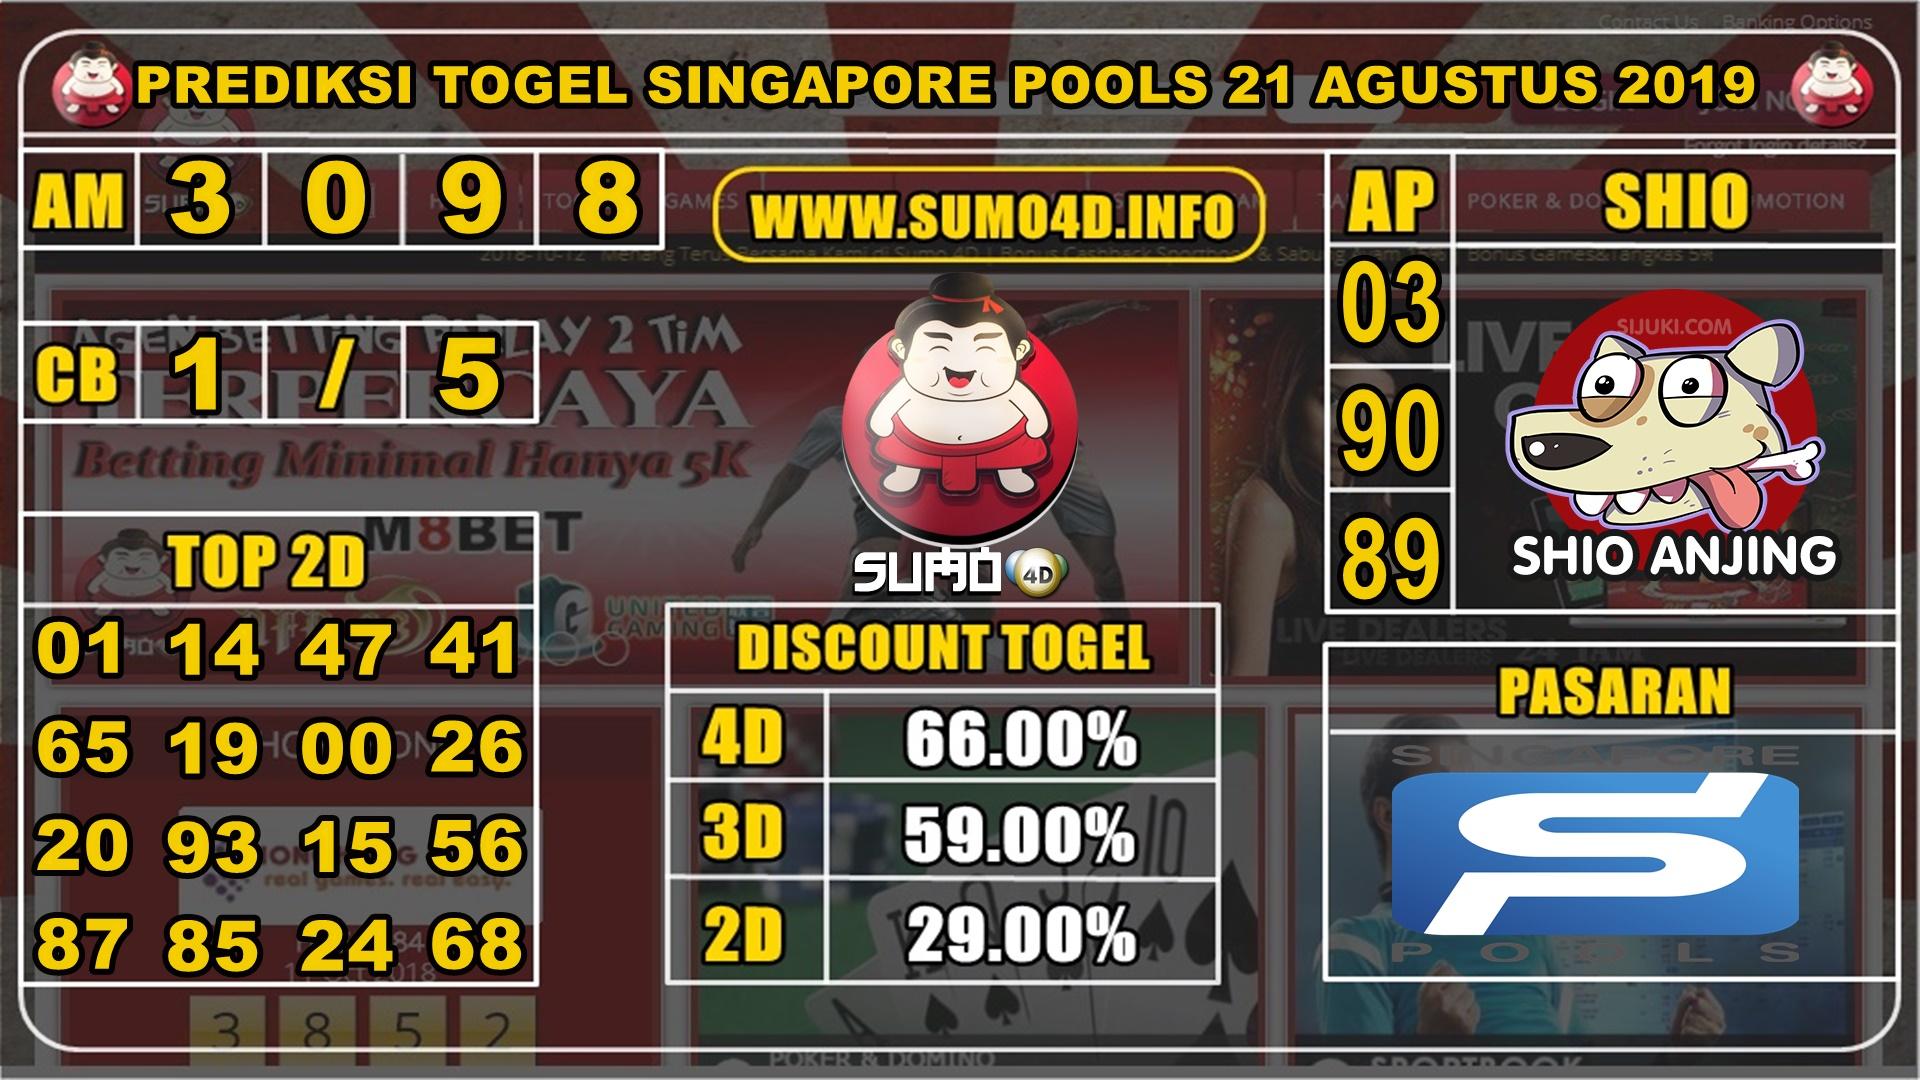 Prediksi Togel Singapore Pools 21 Agustus 2019